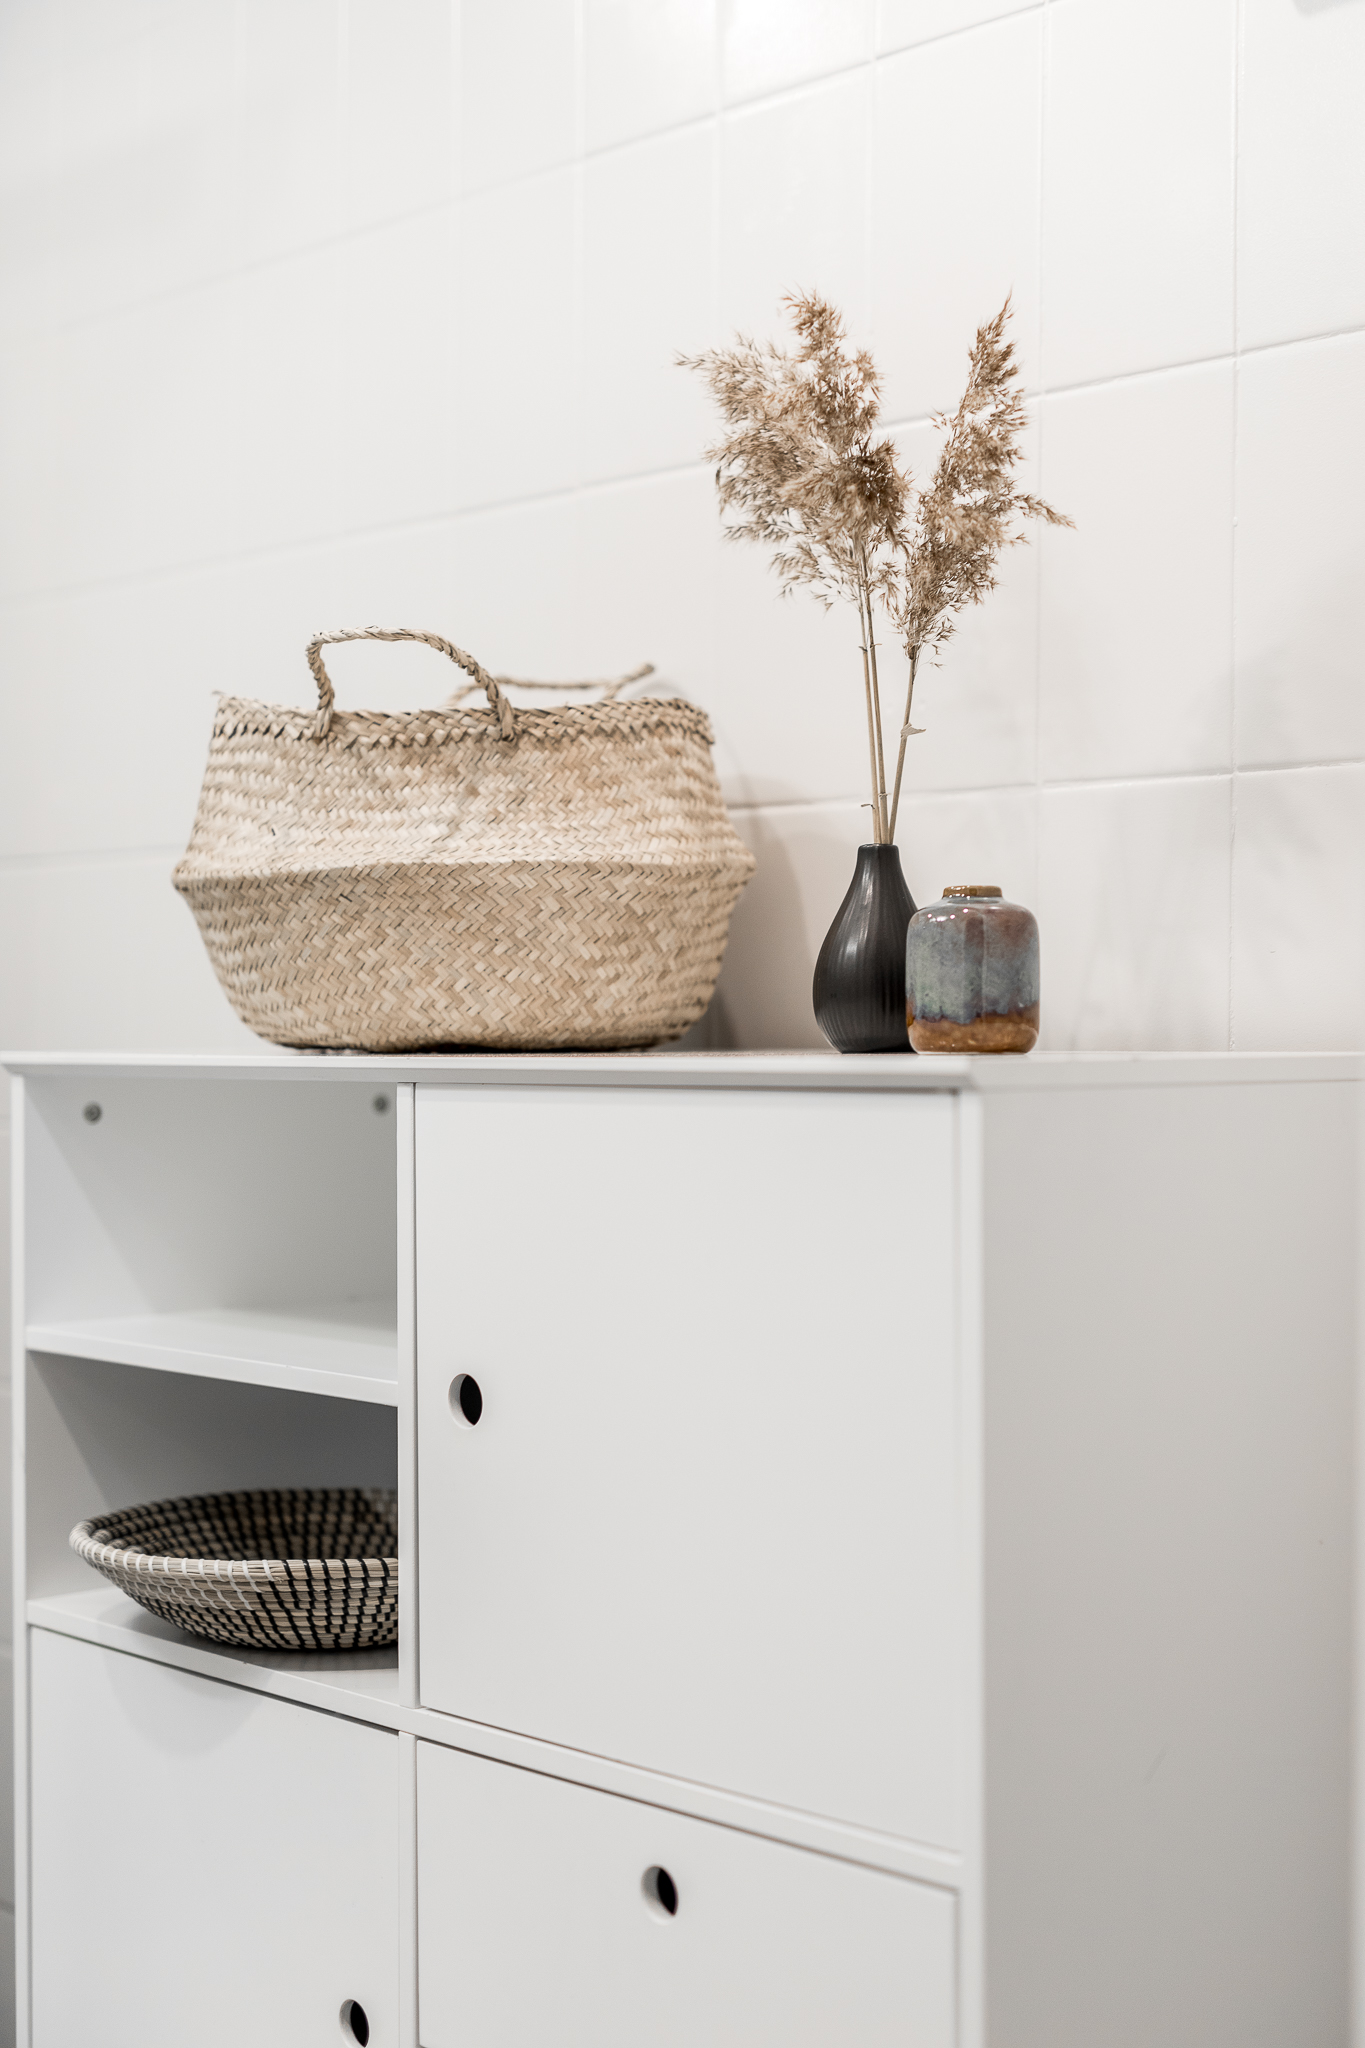 Stailattu kylpyhuone